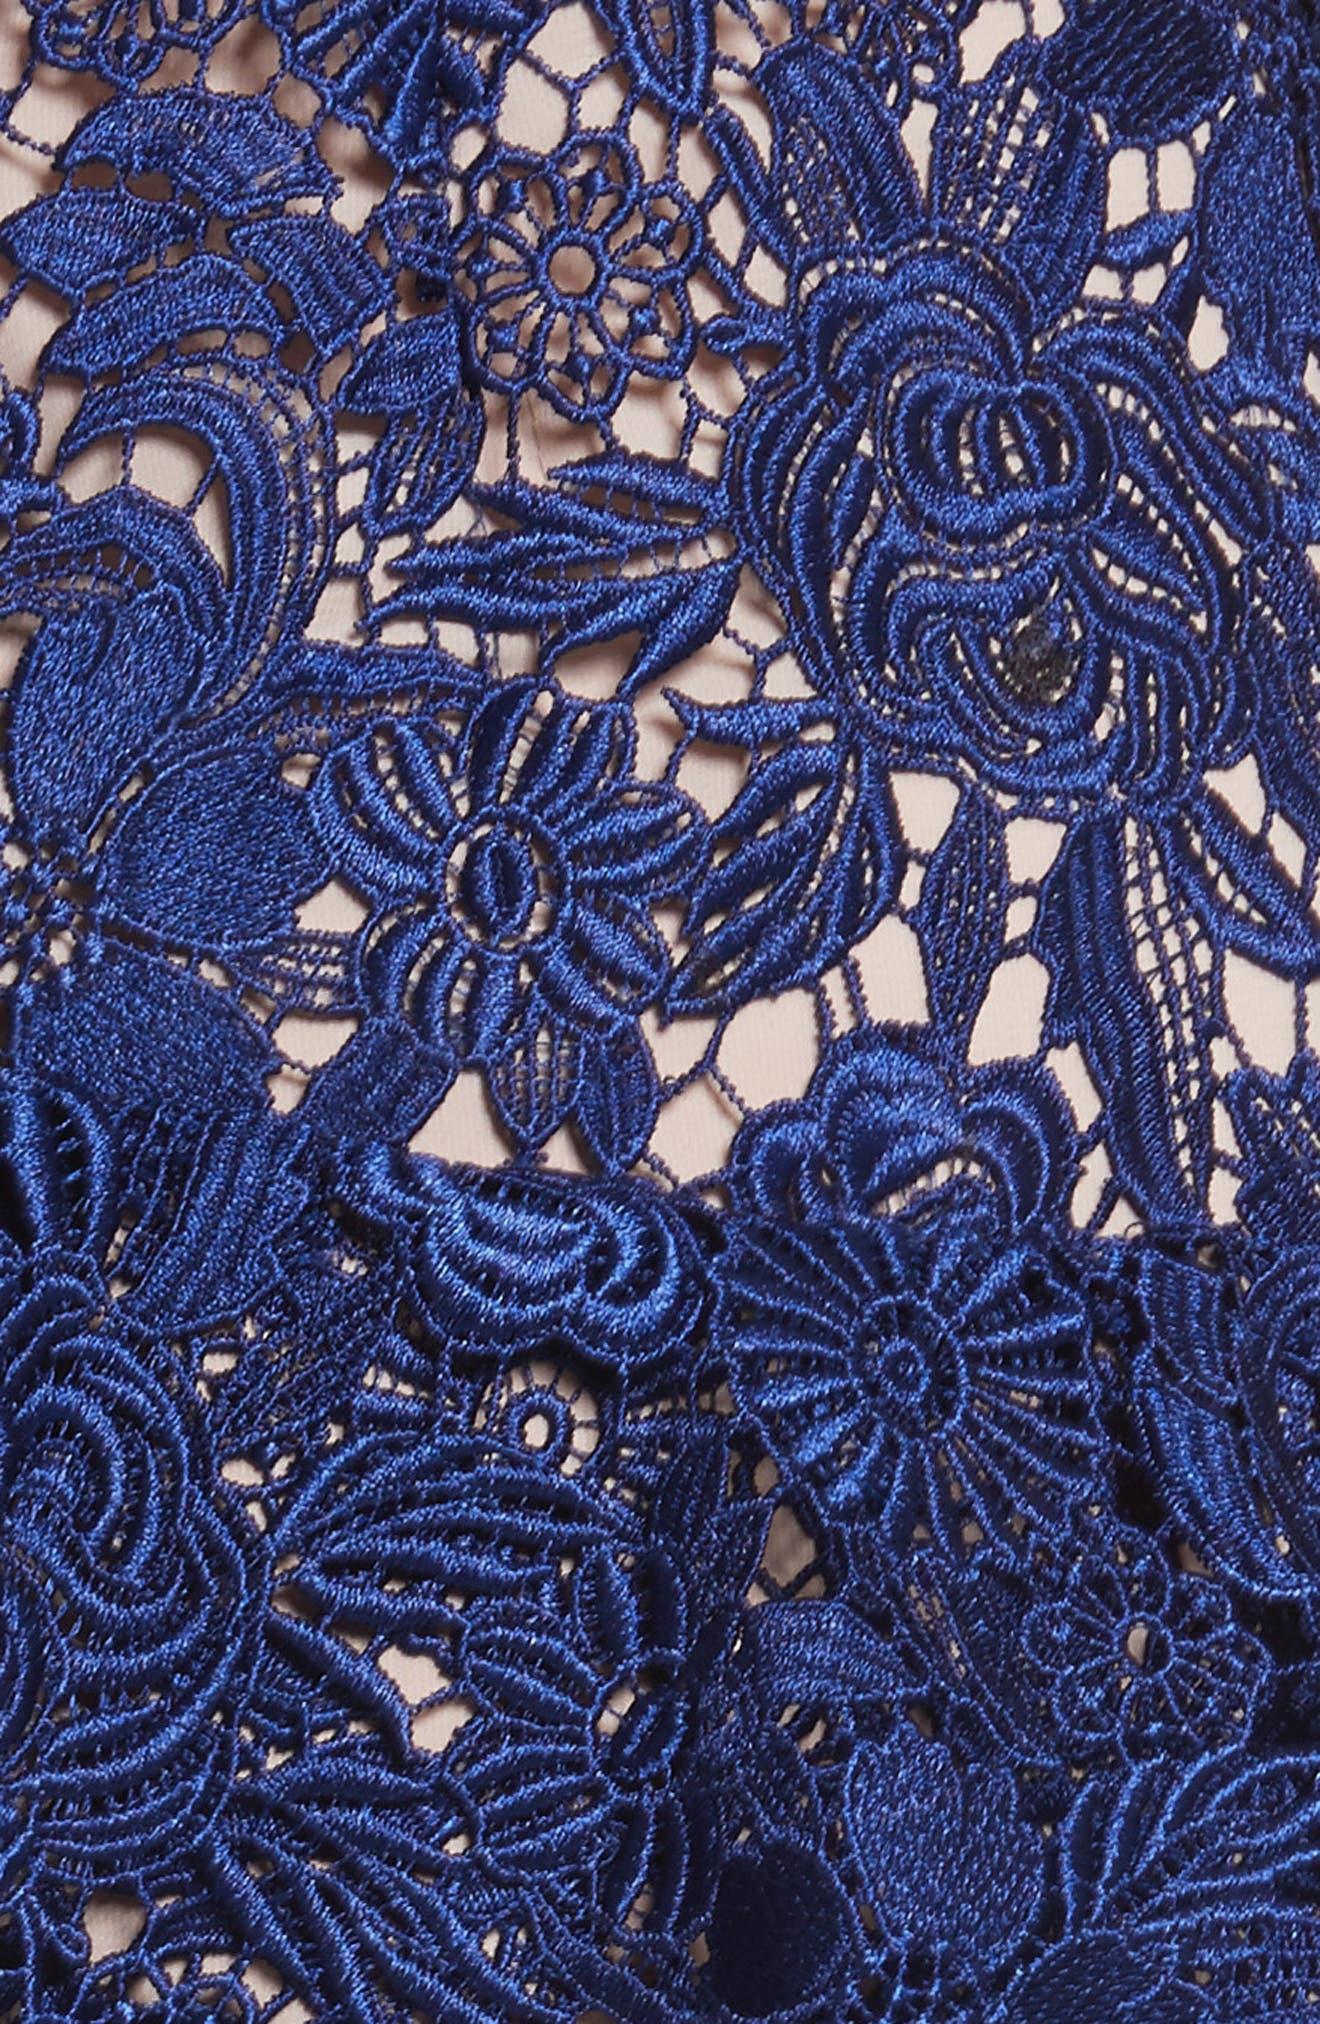 Florrie Ruffled Lace Midi Dress,                             Alternate thumbnail 5, color,                             Indigo/ Nude